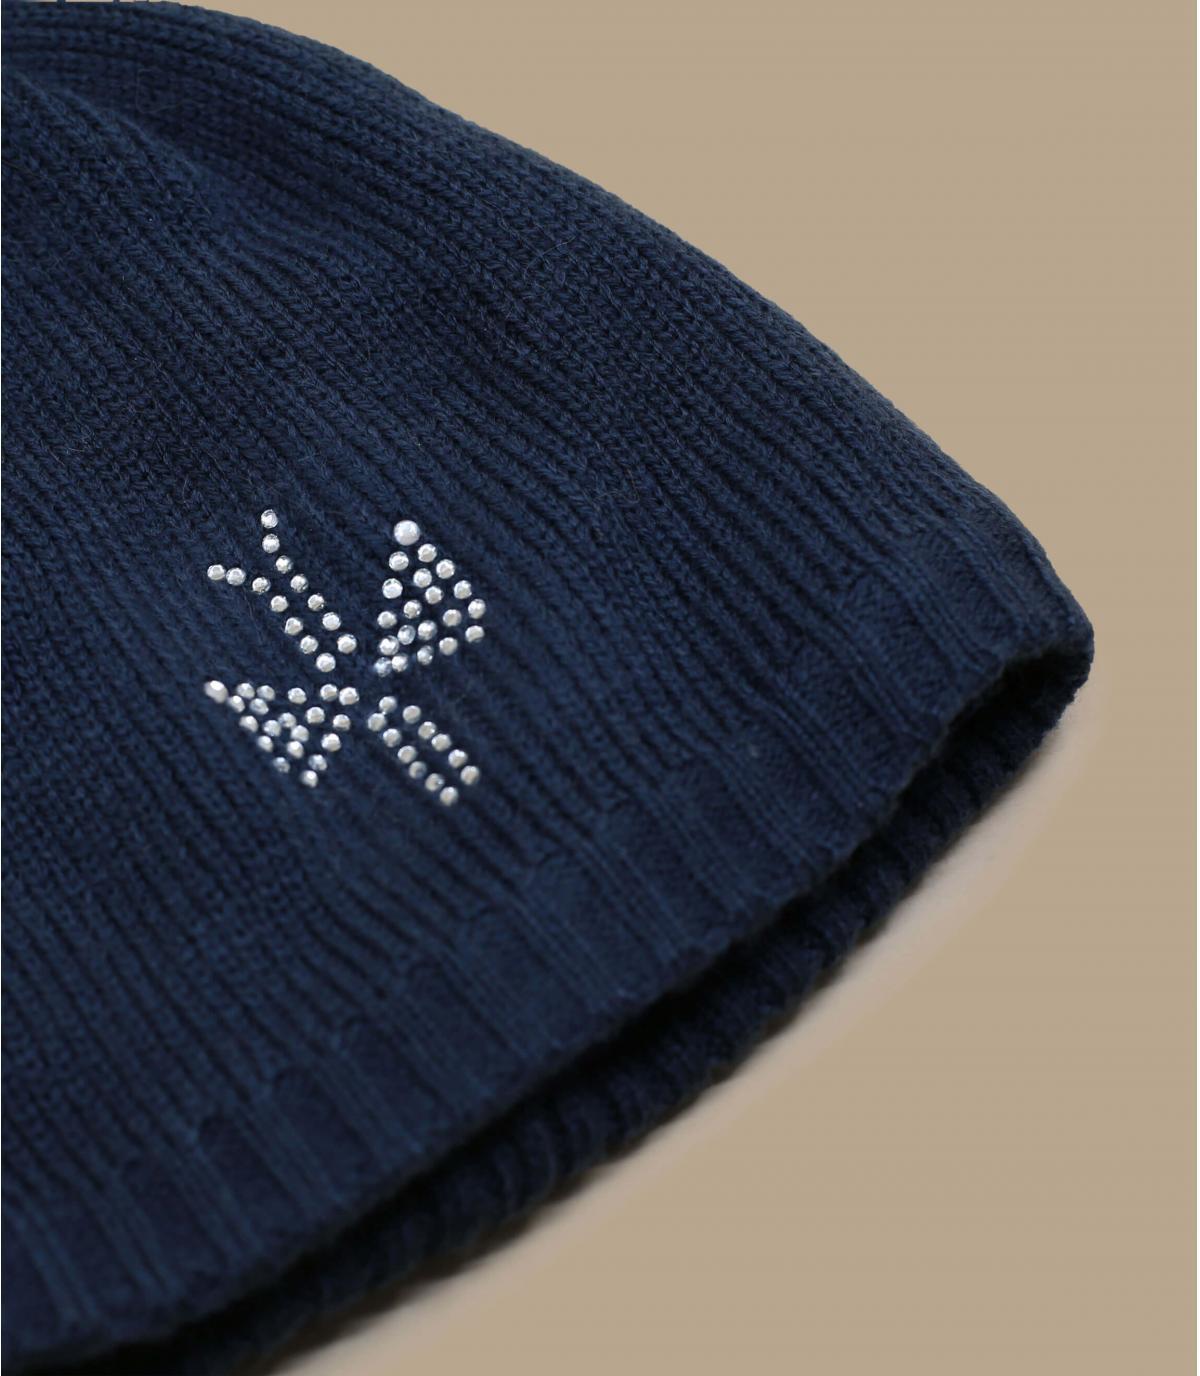 Details Mini Shiny Kid marineblau - Abbildung 3